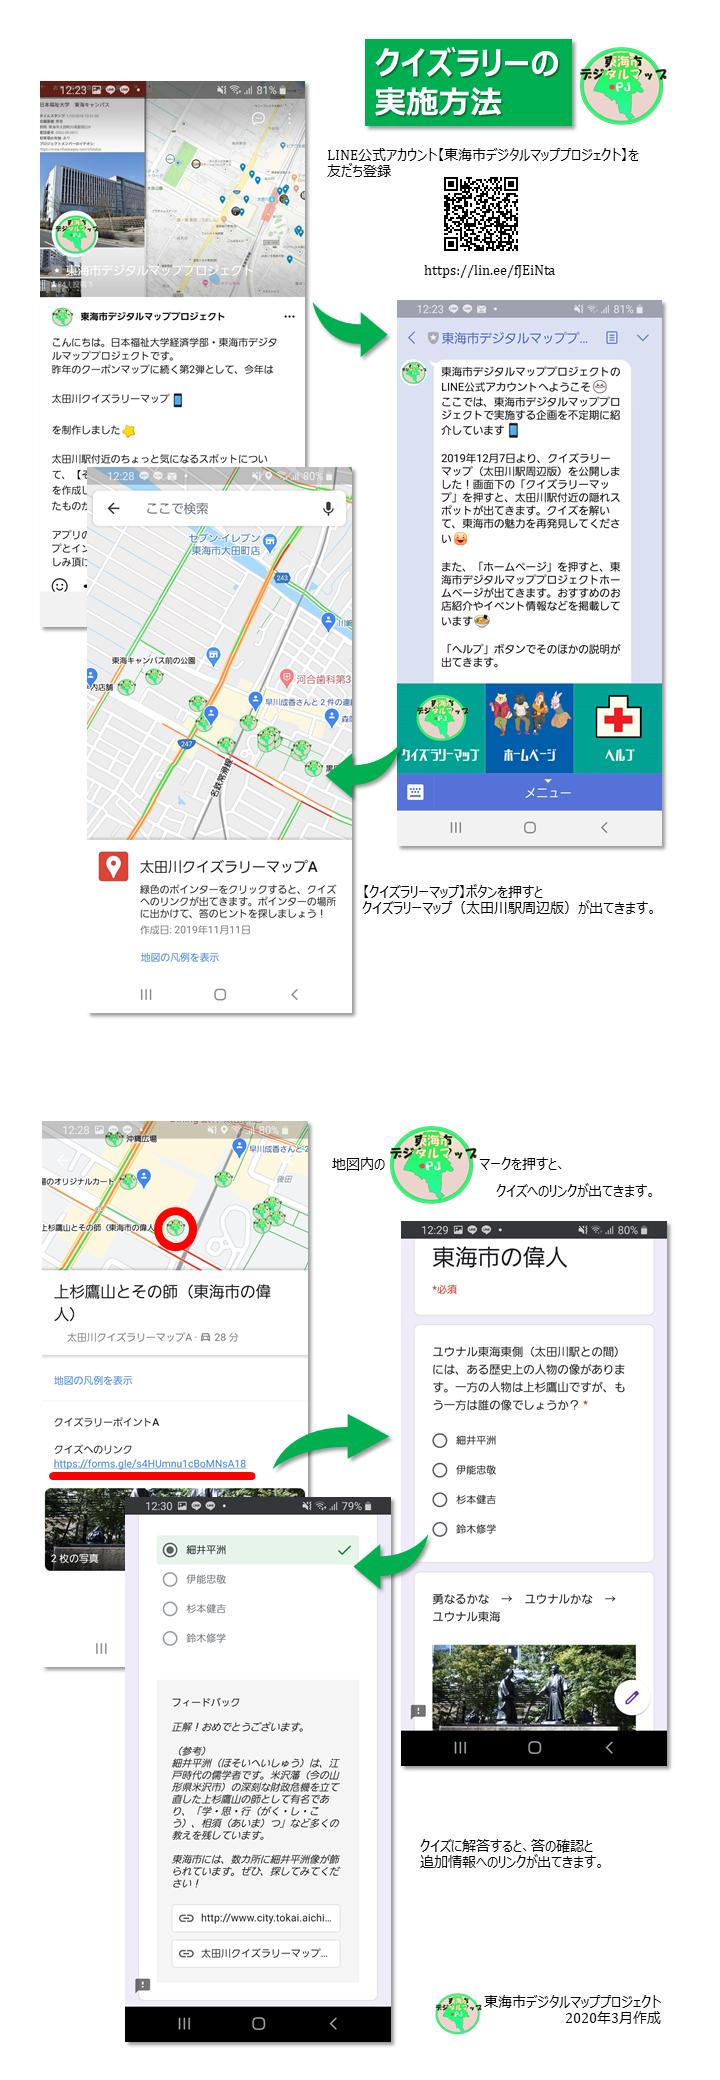 LINE公式アカウントの登録・基本的な使い方_2019(掲載用).png